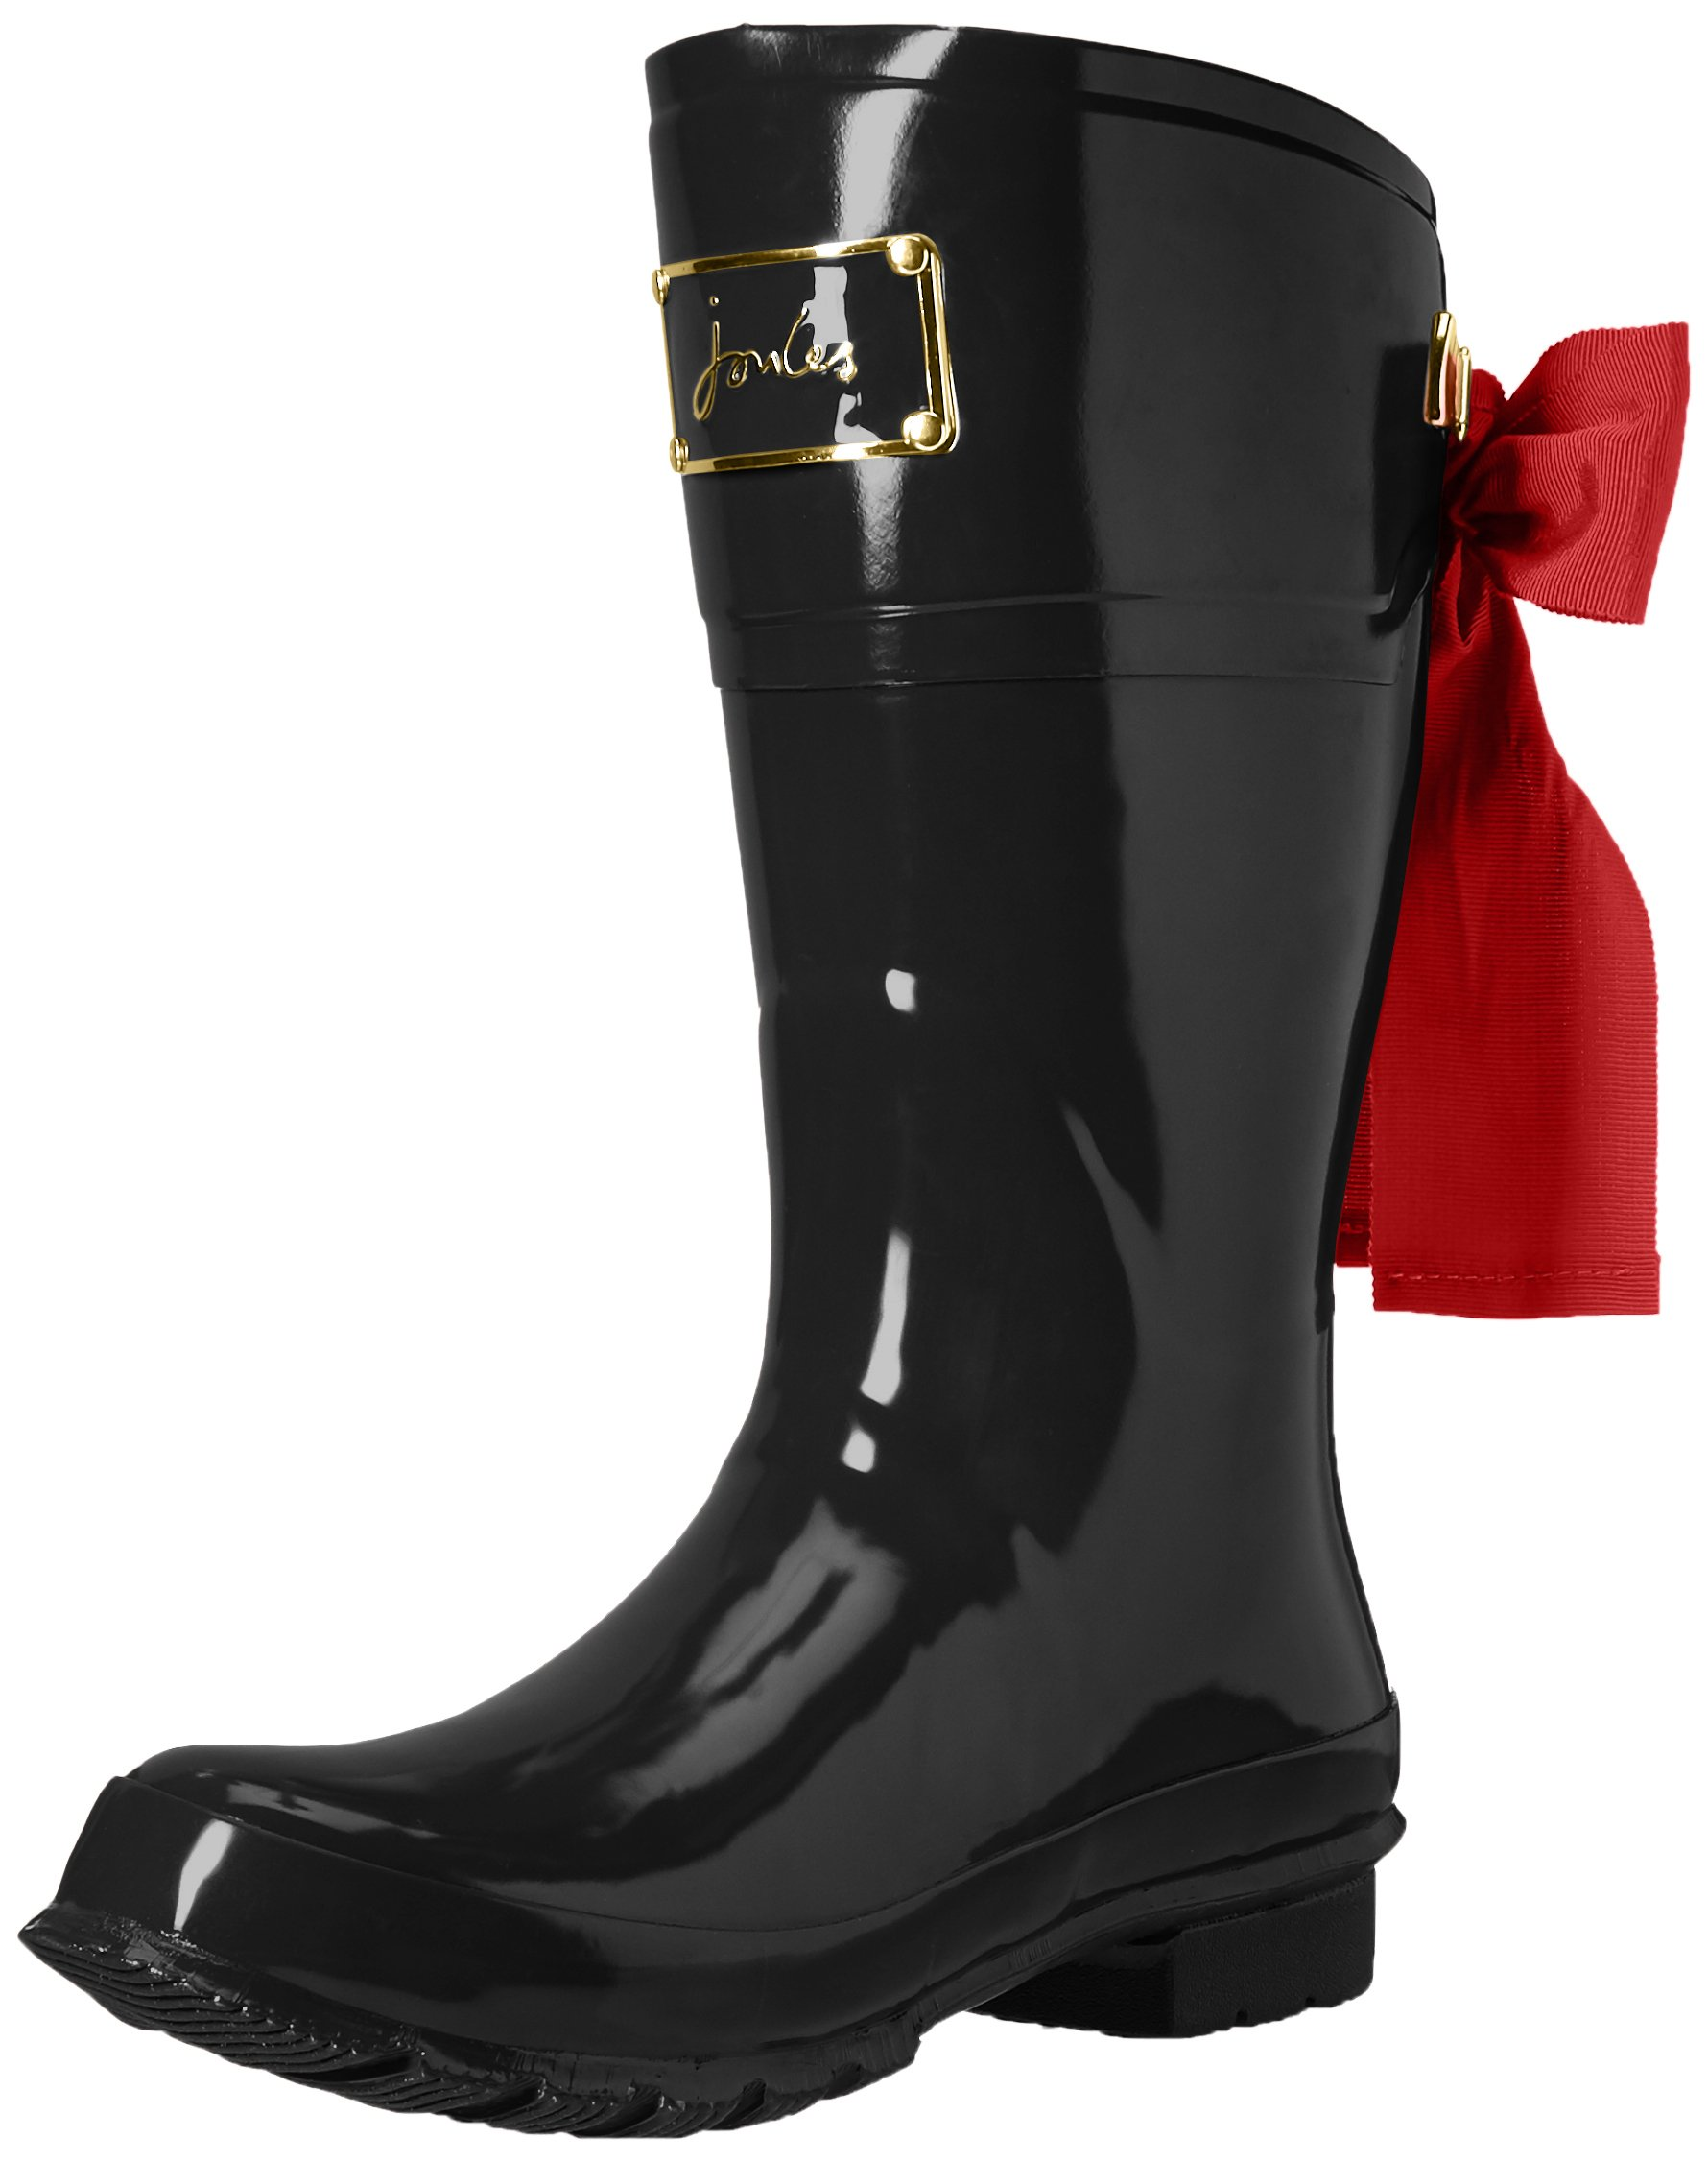 Joules Women's Evedon Short Rain Boot, Black, 5 M US